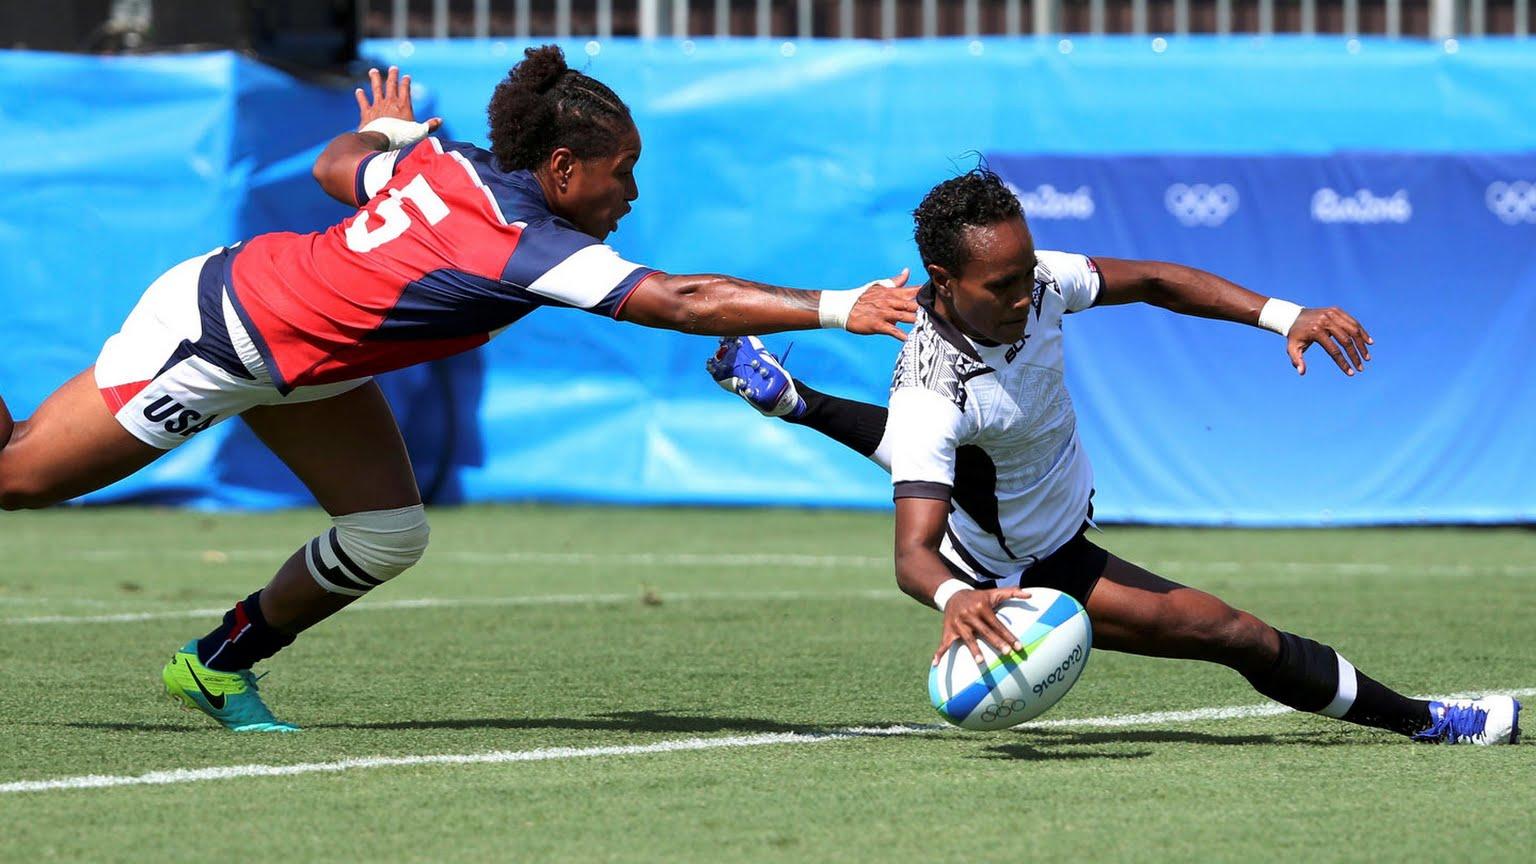 Primele rezultate din turneul olimpic feminin